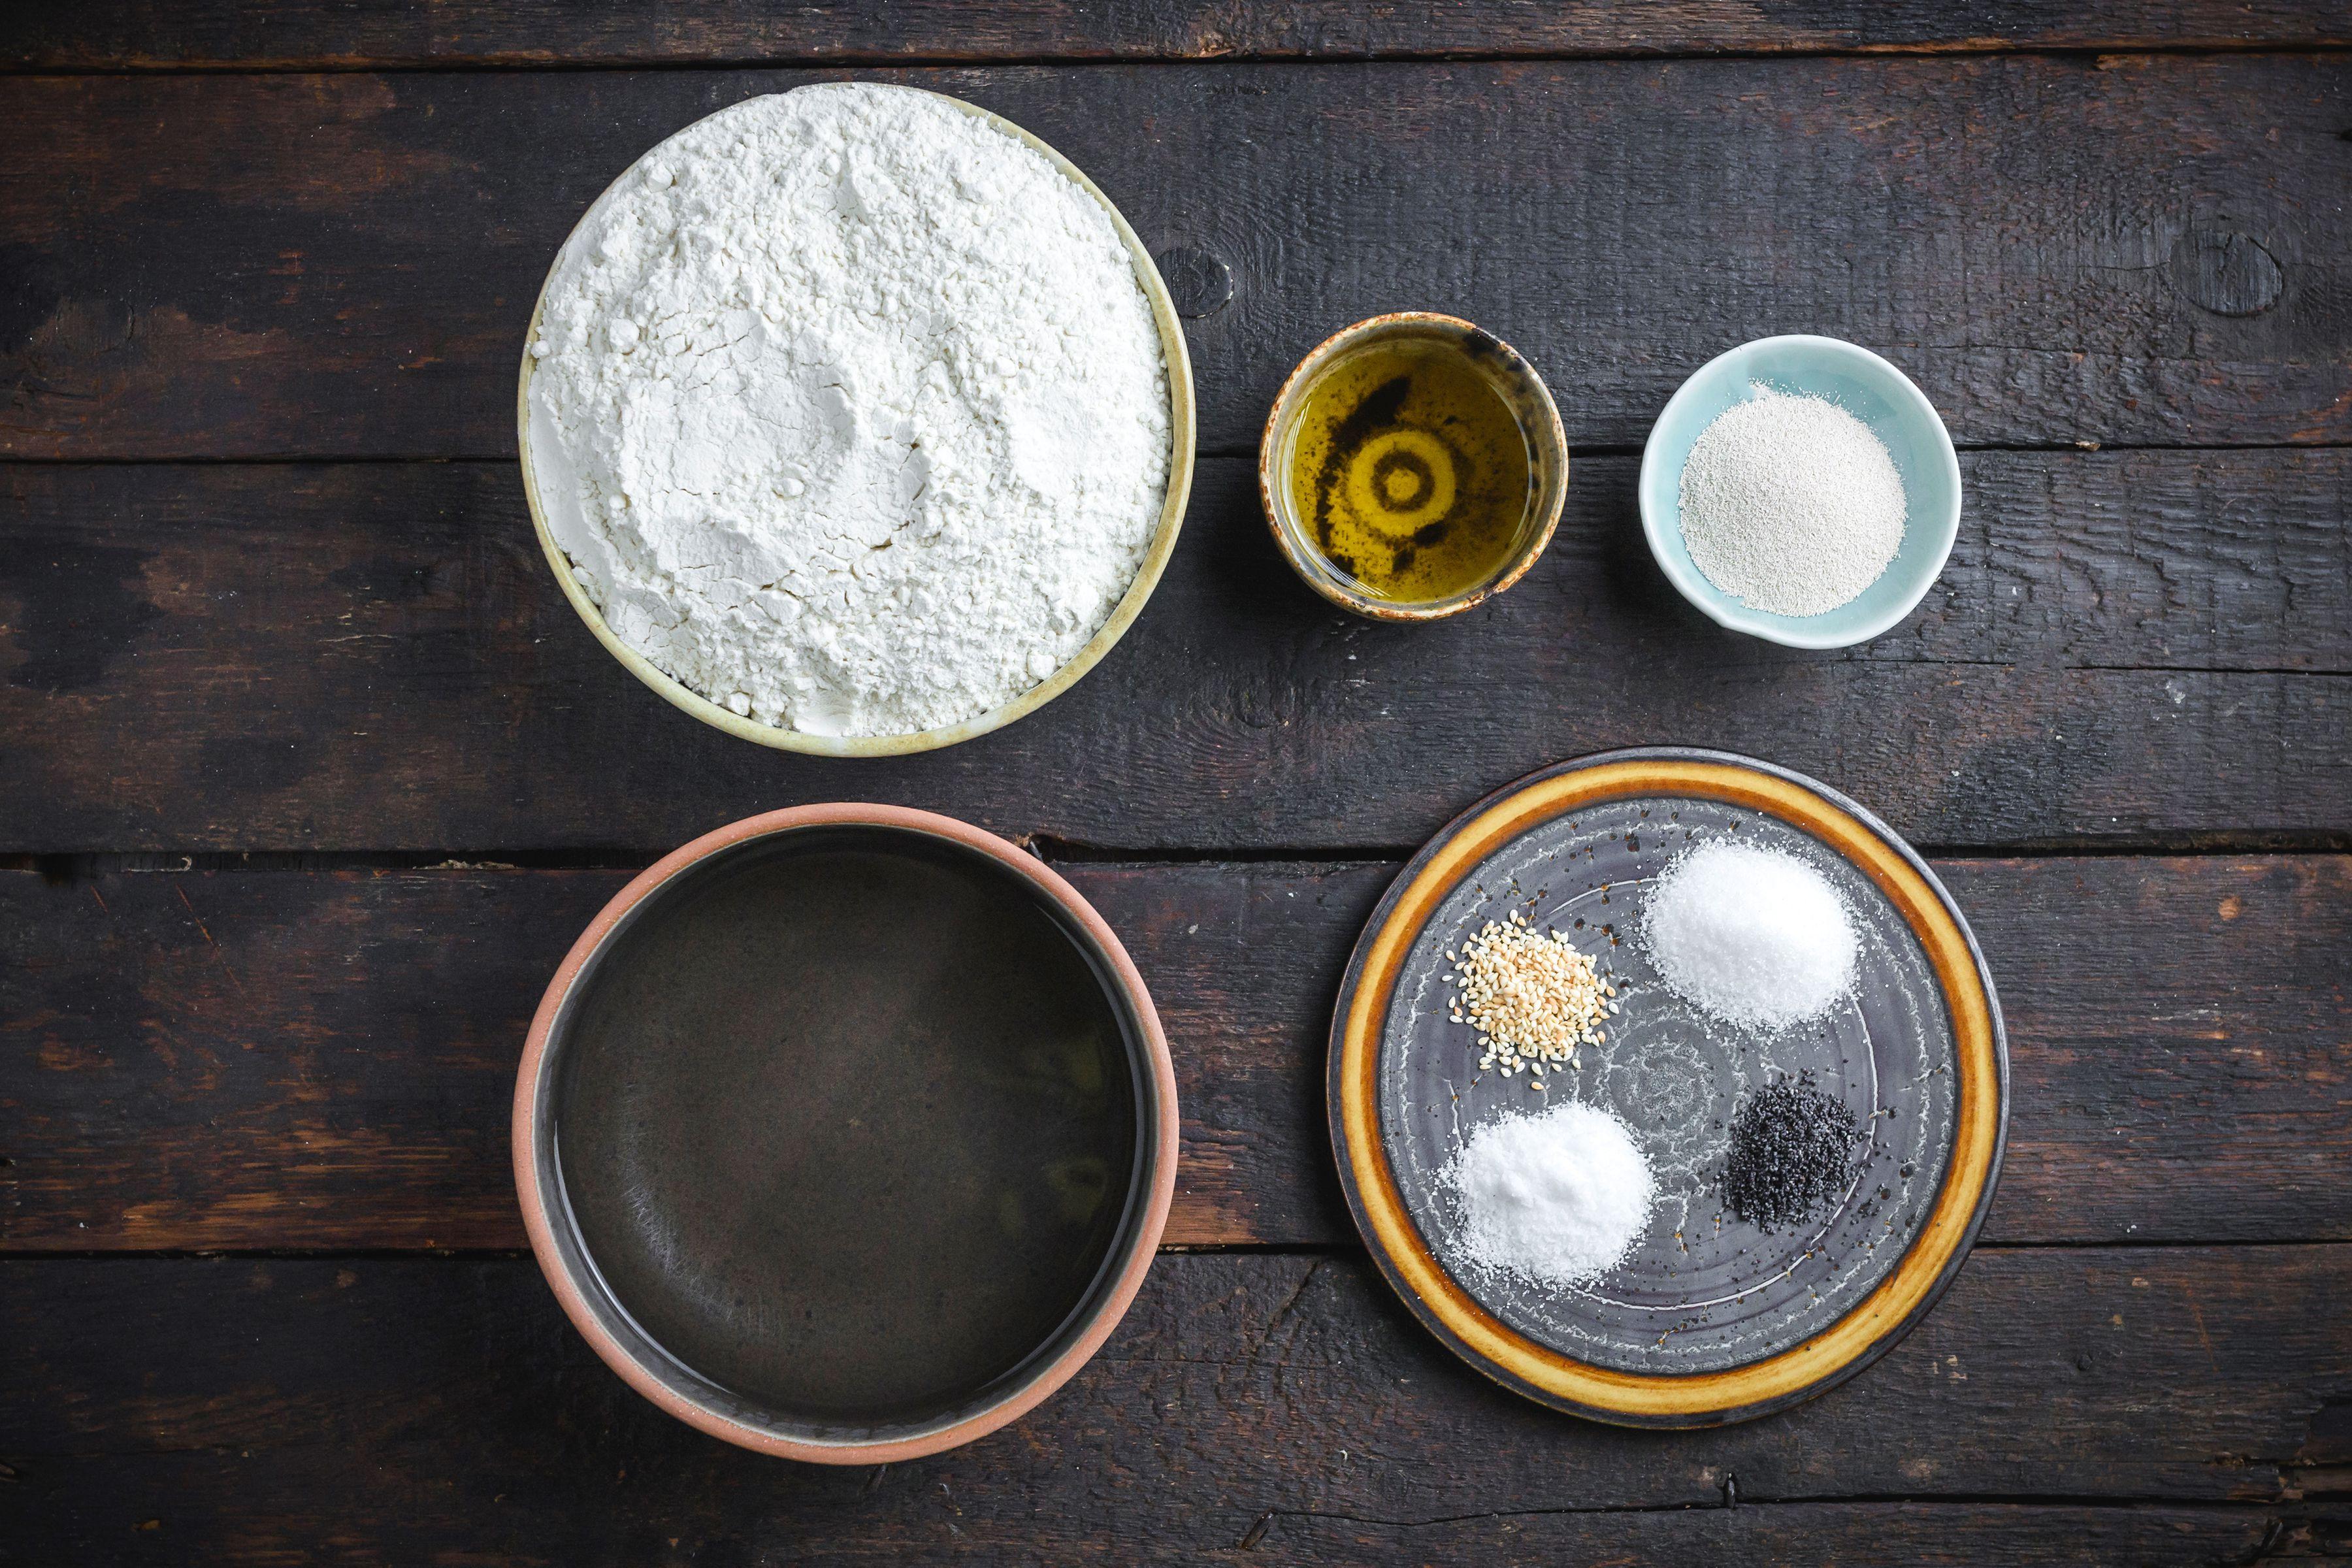 Ingredients for lavash flatbread